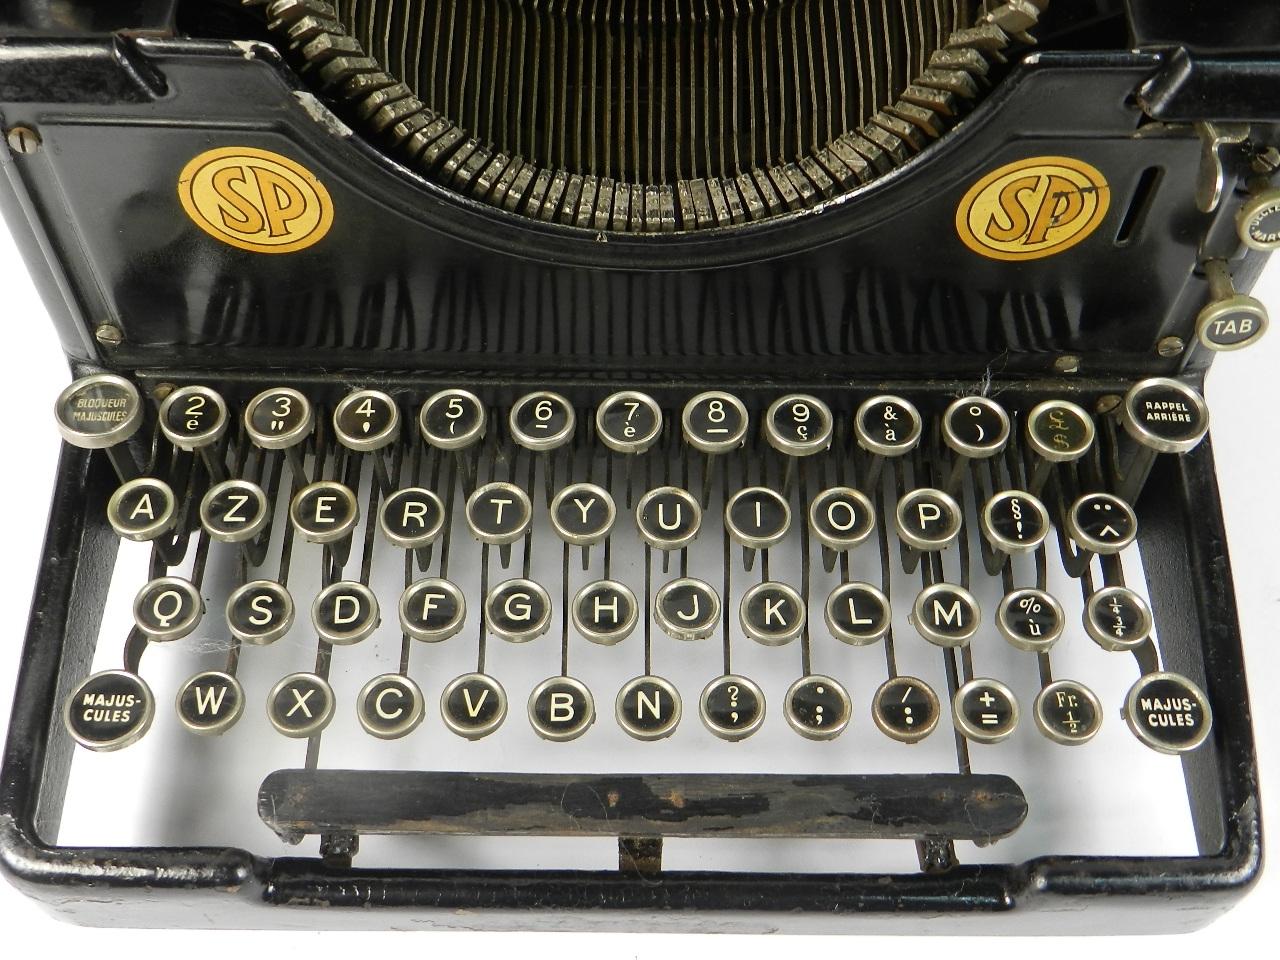 Imagen SMITH PREMIER Mod 50 AÑO 1923 31202